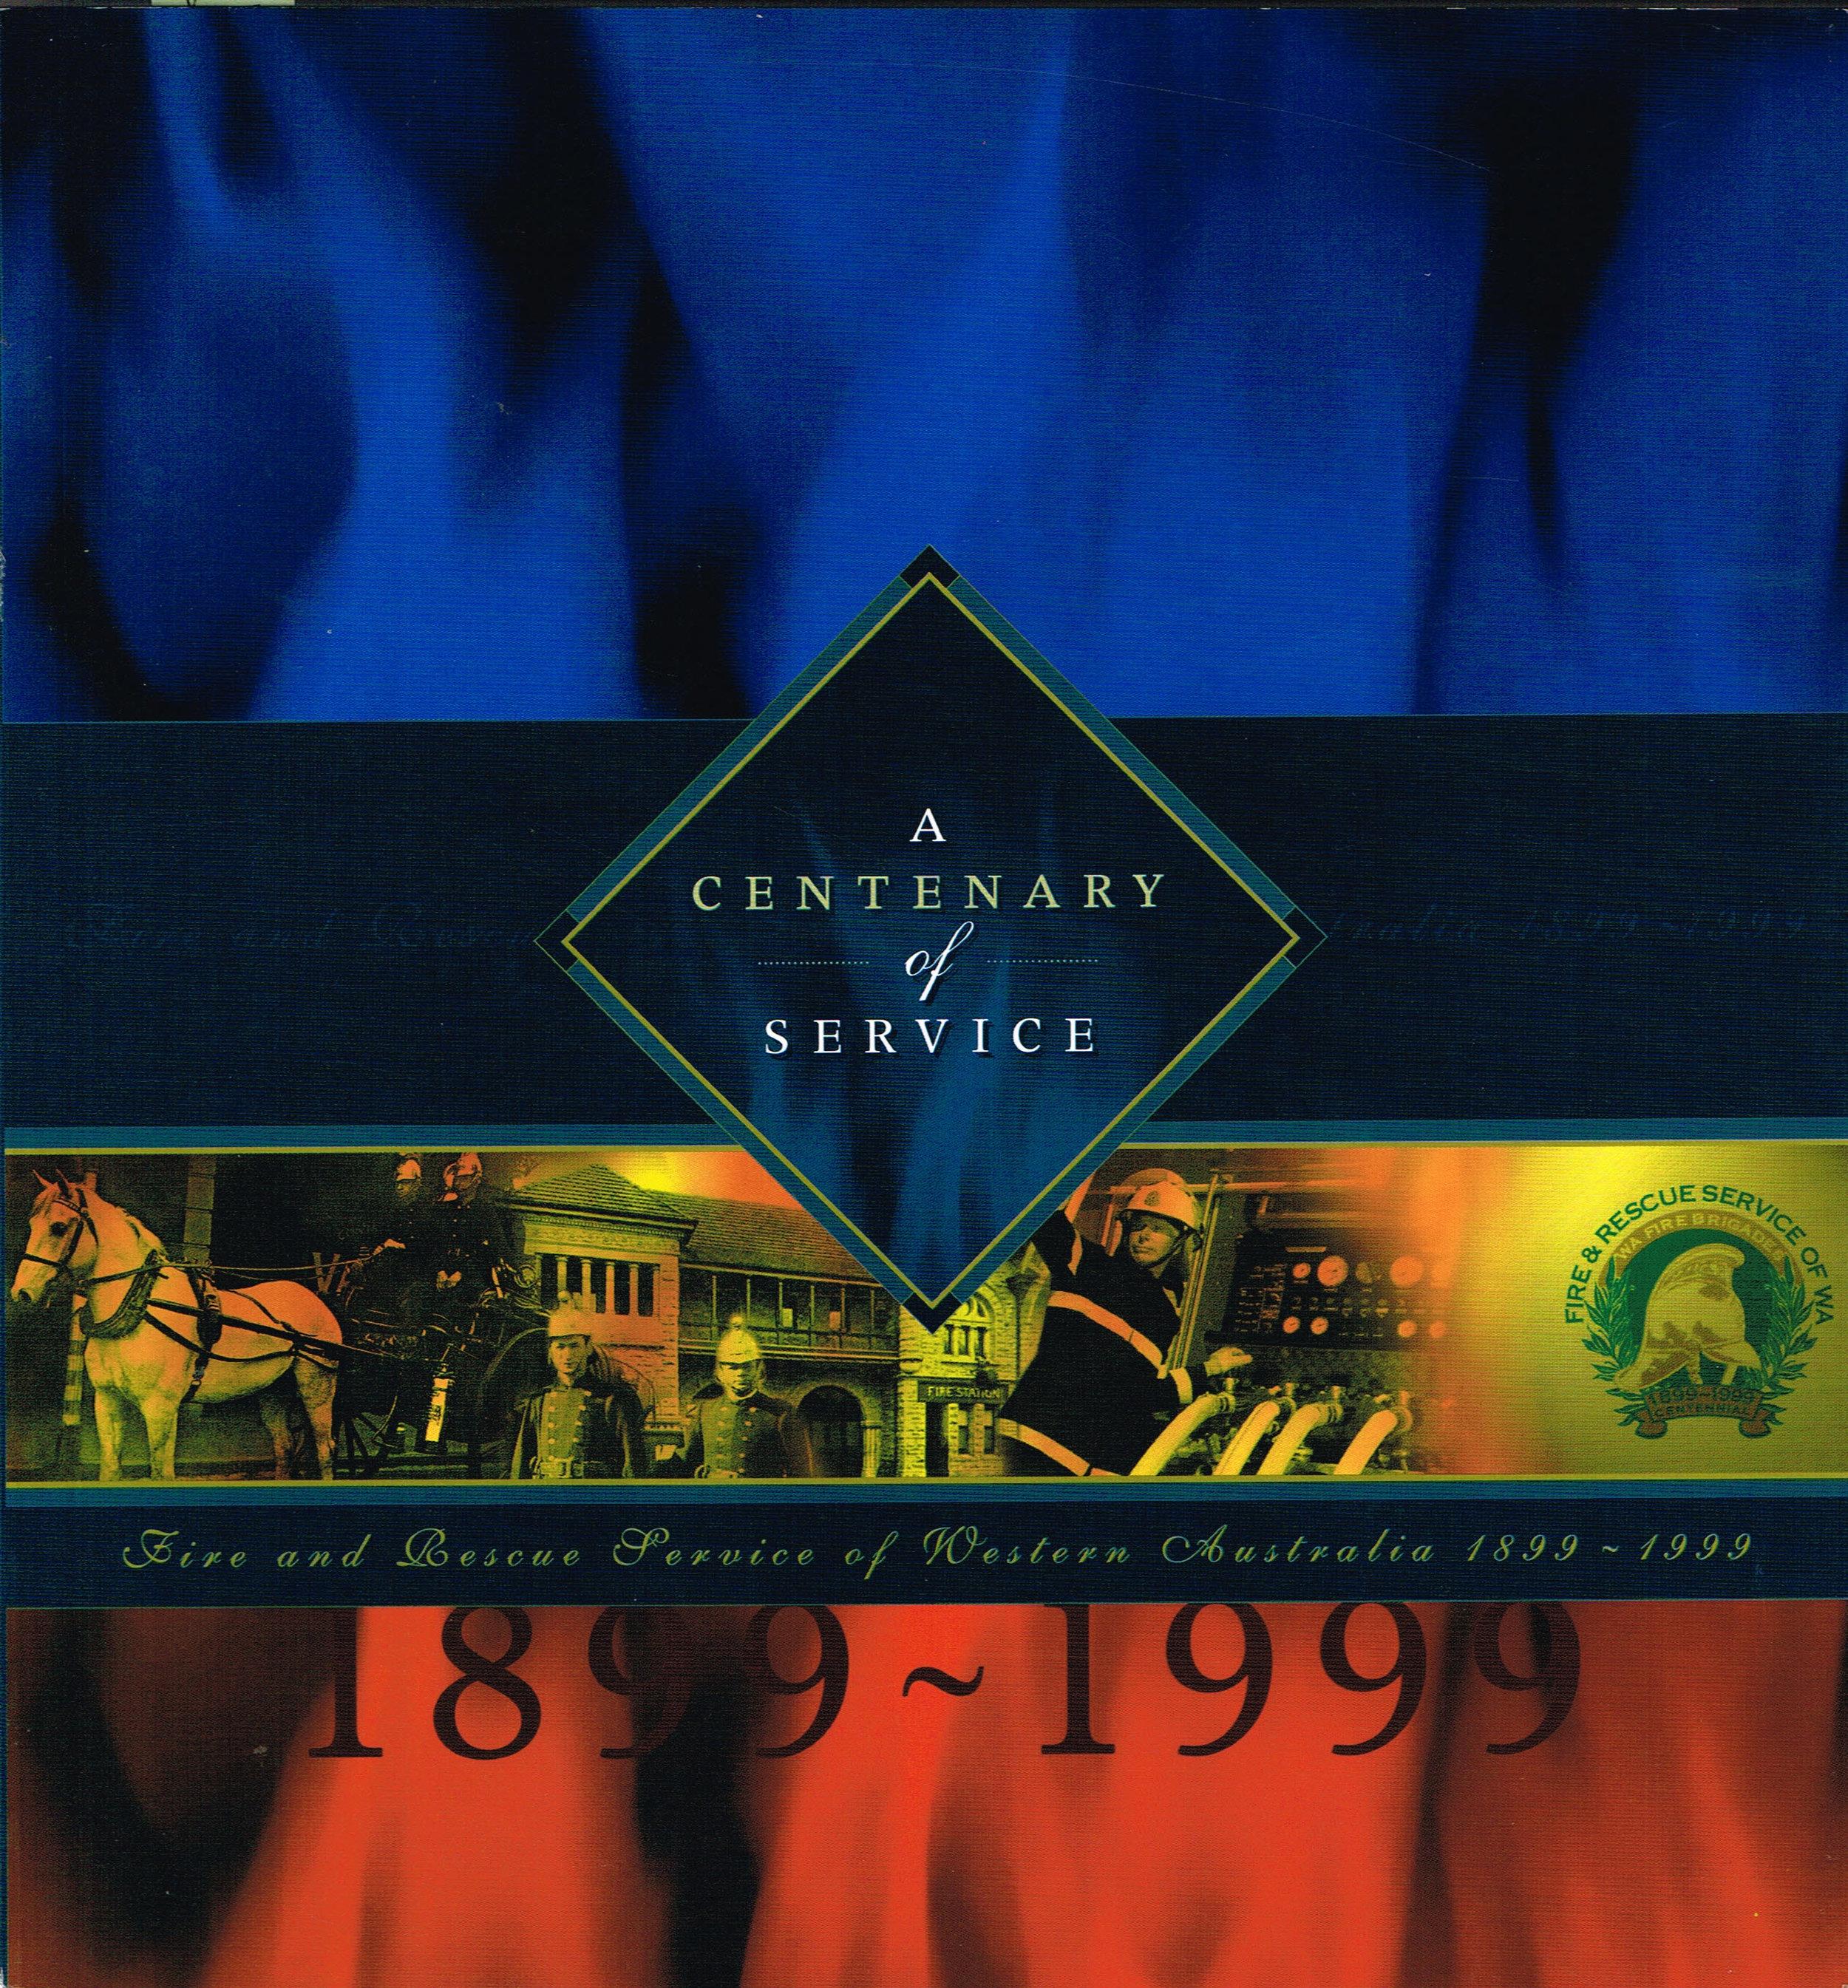 A_Centenary_of Service.jpg